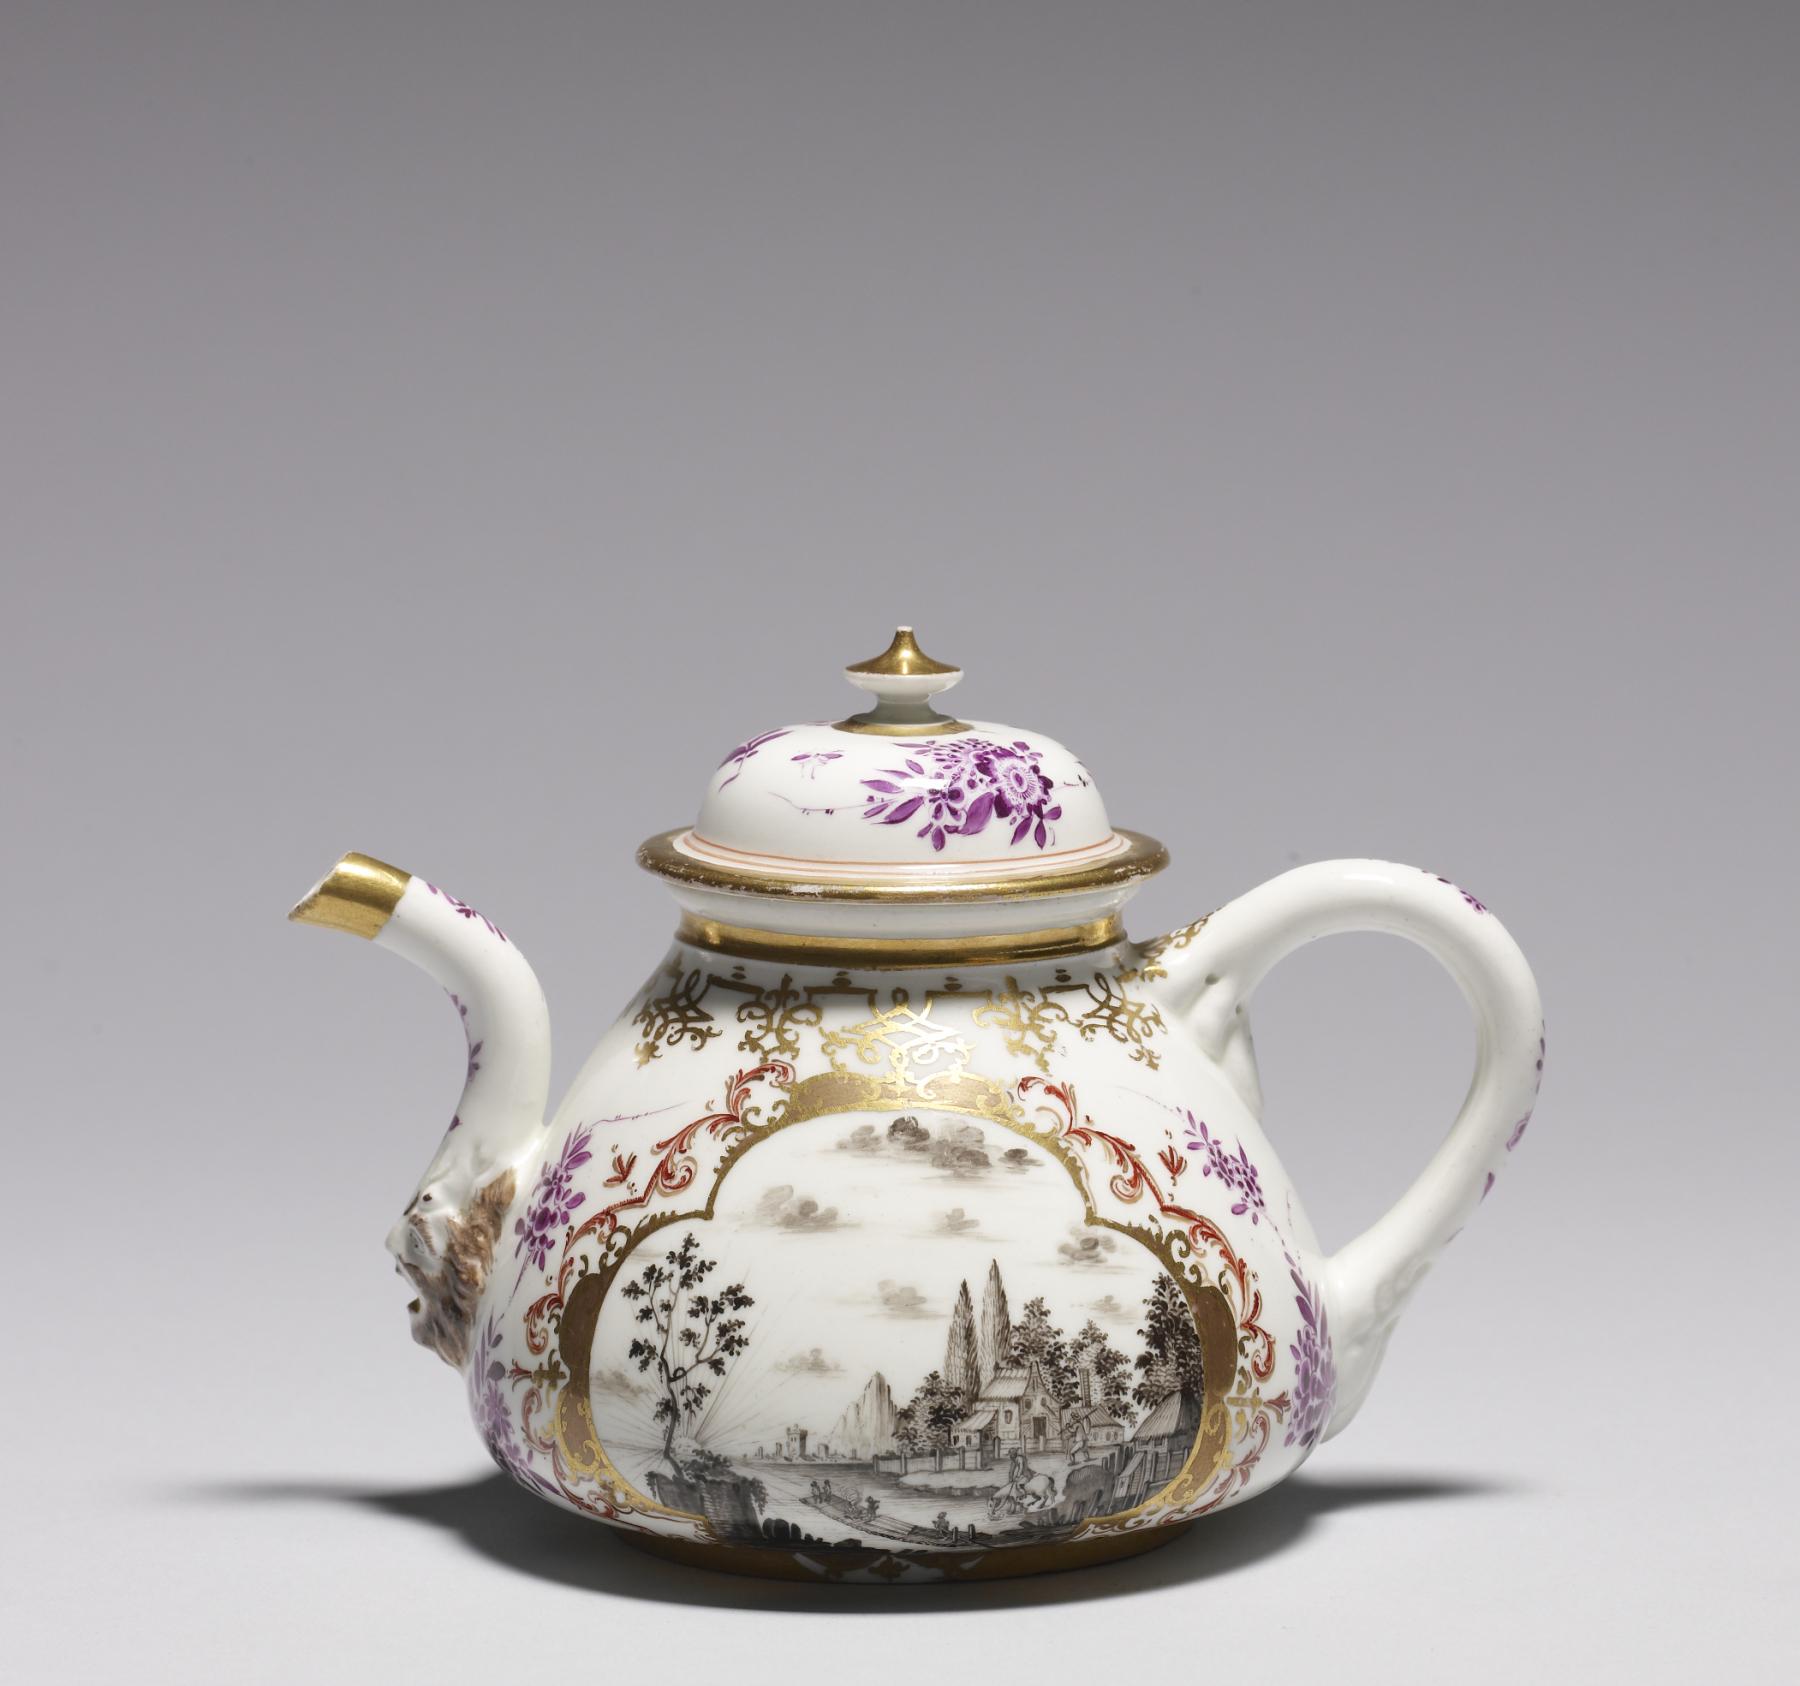 Drawn teapot porcelain  Porcelain Side Manufactory File:Meissen